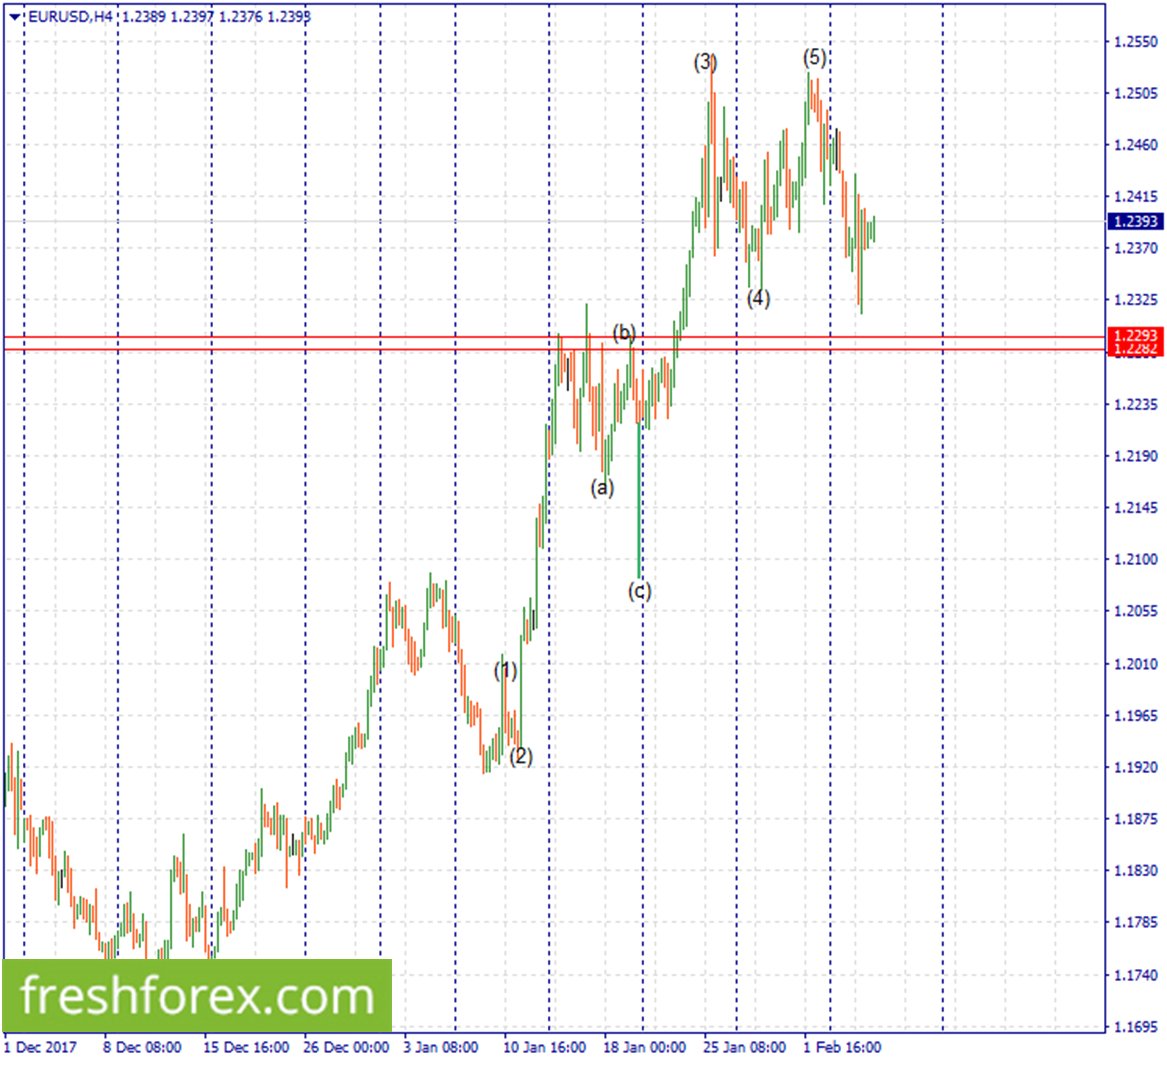 Rebuy euro around 1.2293